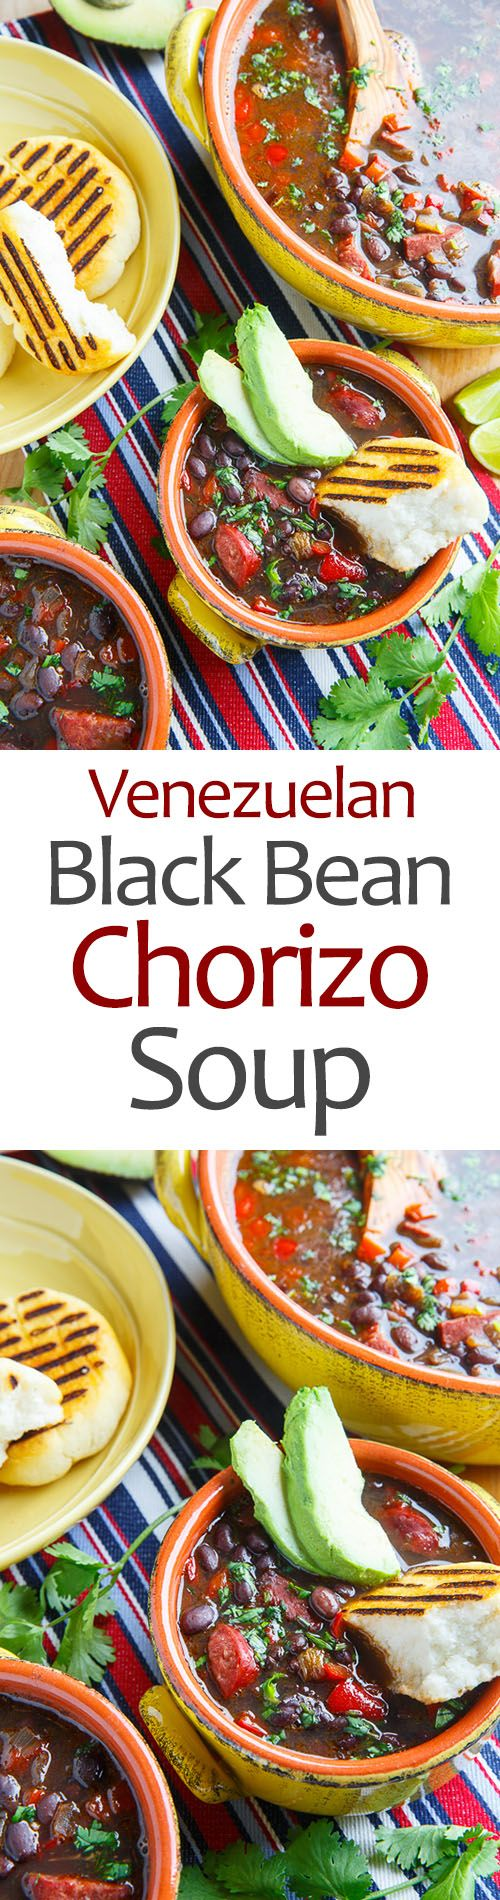 Venezuelan Black Bean and Chorizo Soup | Closet cooking